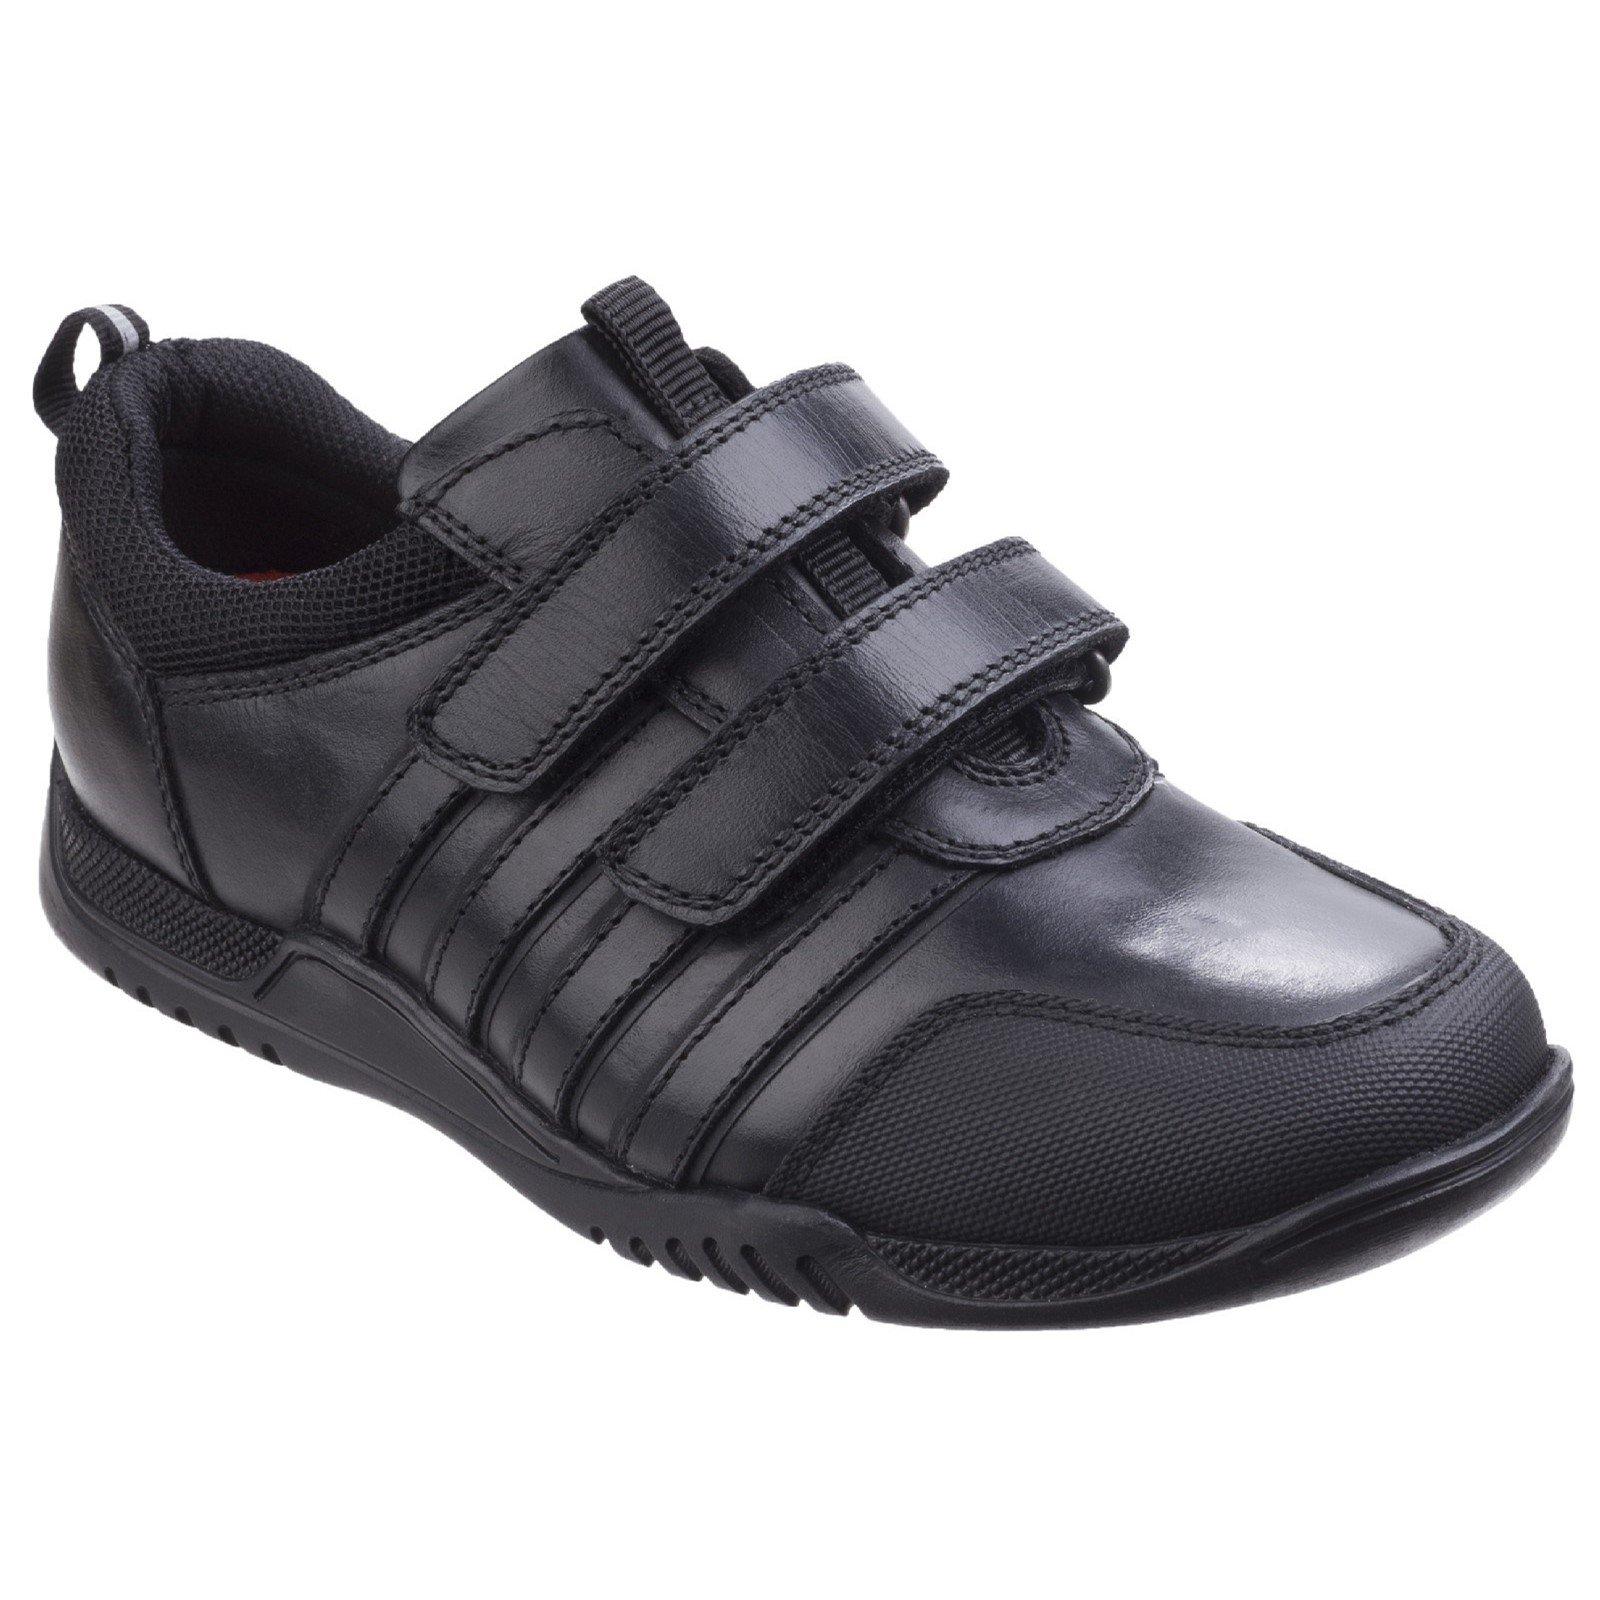 Hush Puppies Kid's Josh Senior School Shoe Black 26396 - Black 5